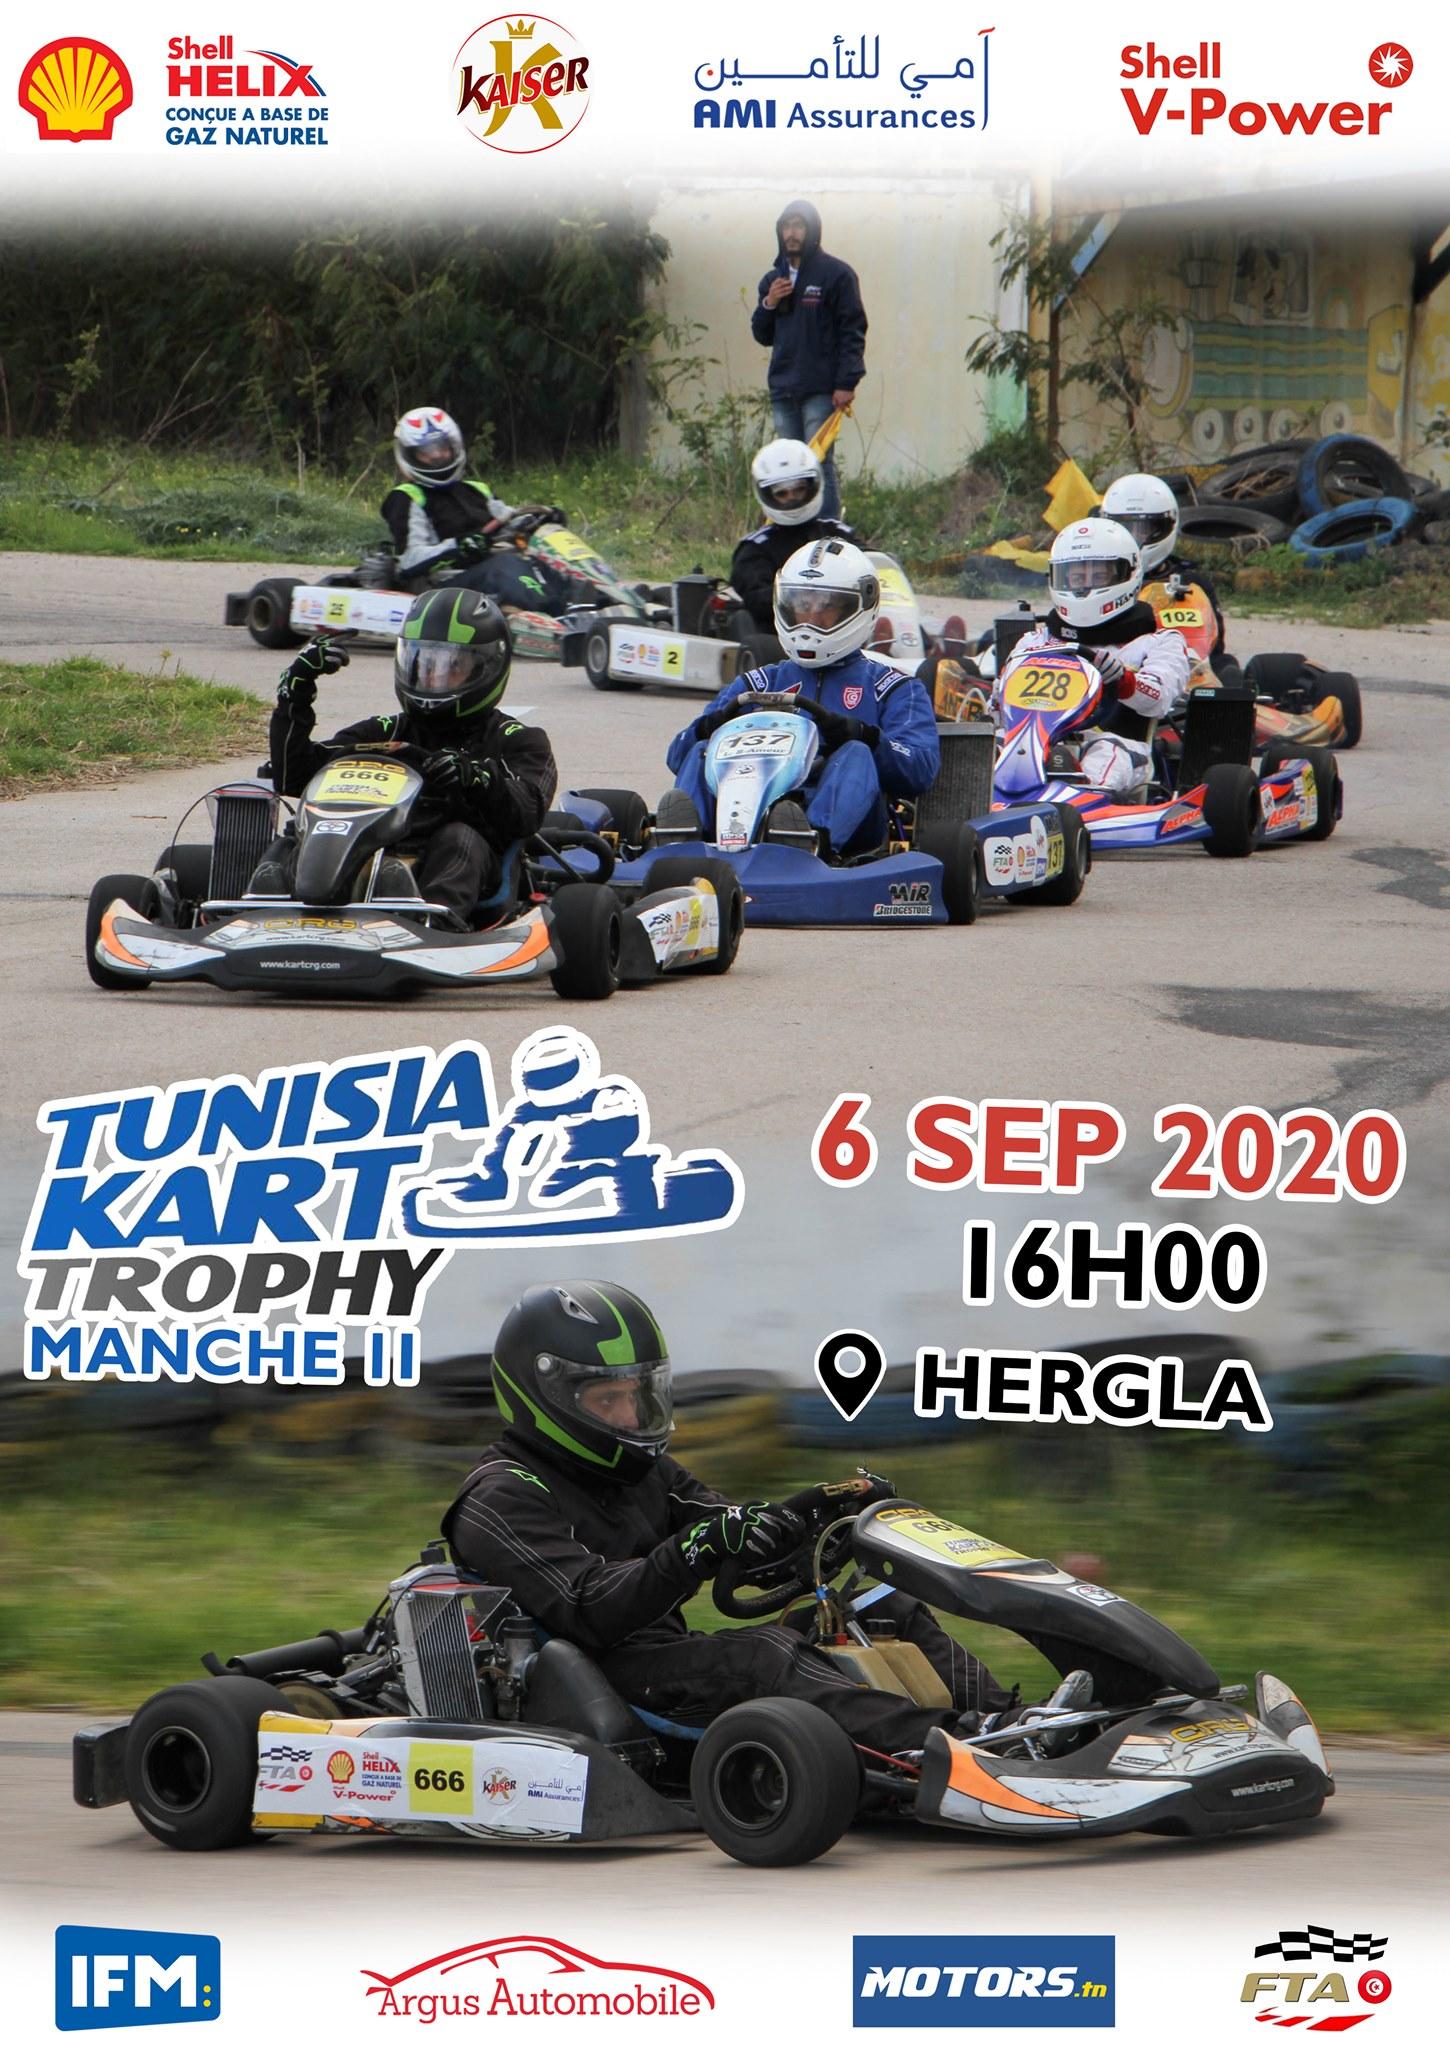 Manche 2 – Tunisia Kart Trophy 2020